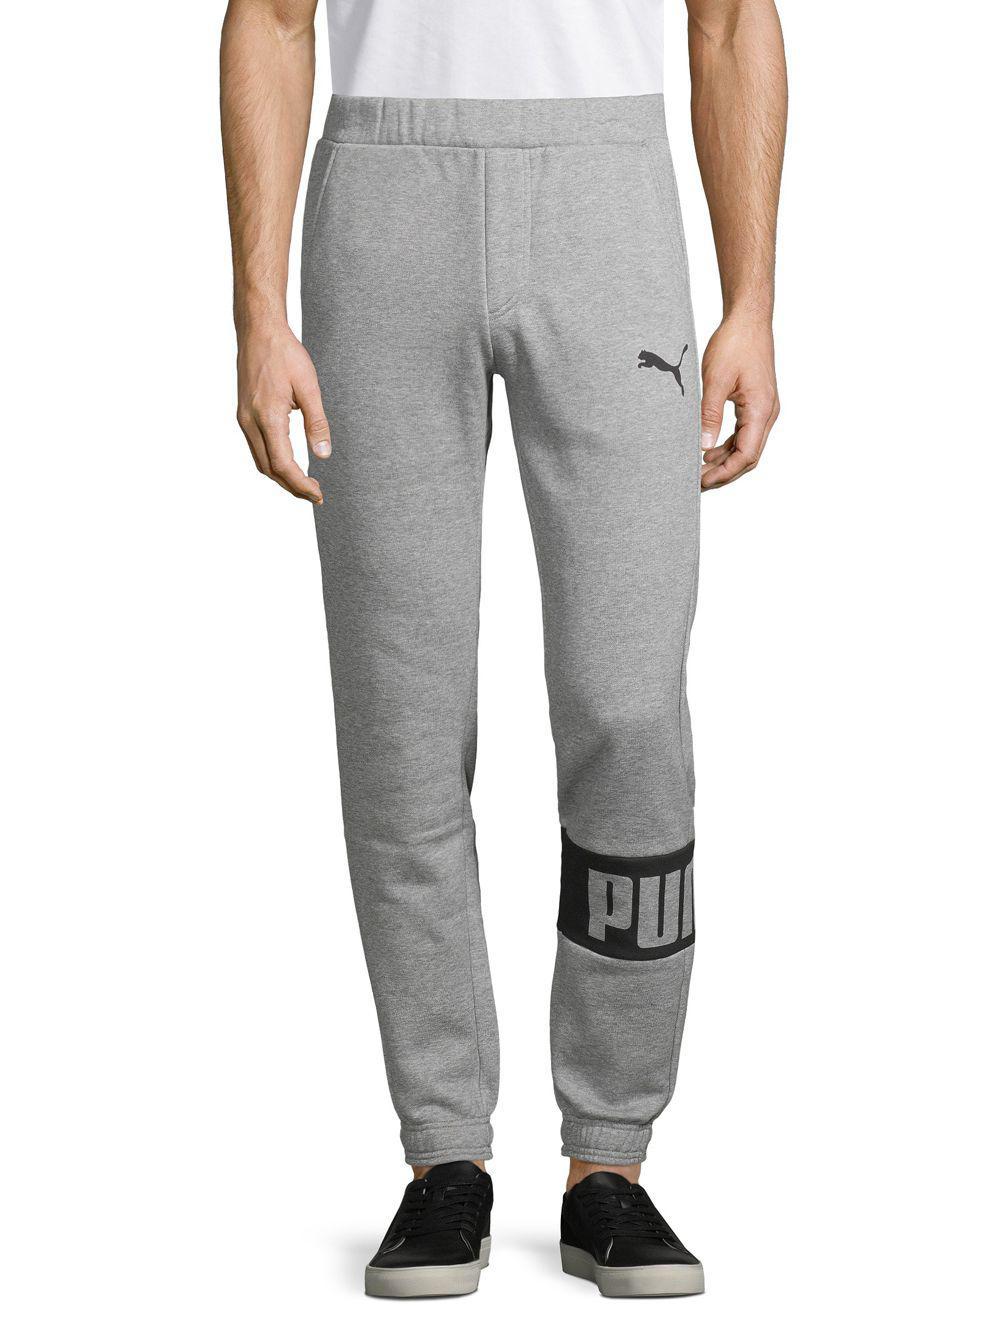 fbbdb4187577 PUMA Rebel Logo Sweatpants in Gray for Men - Lyst